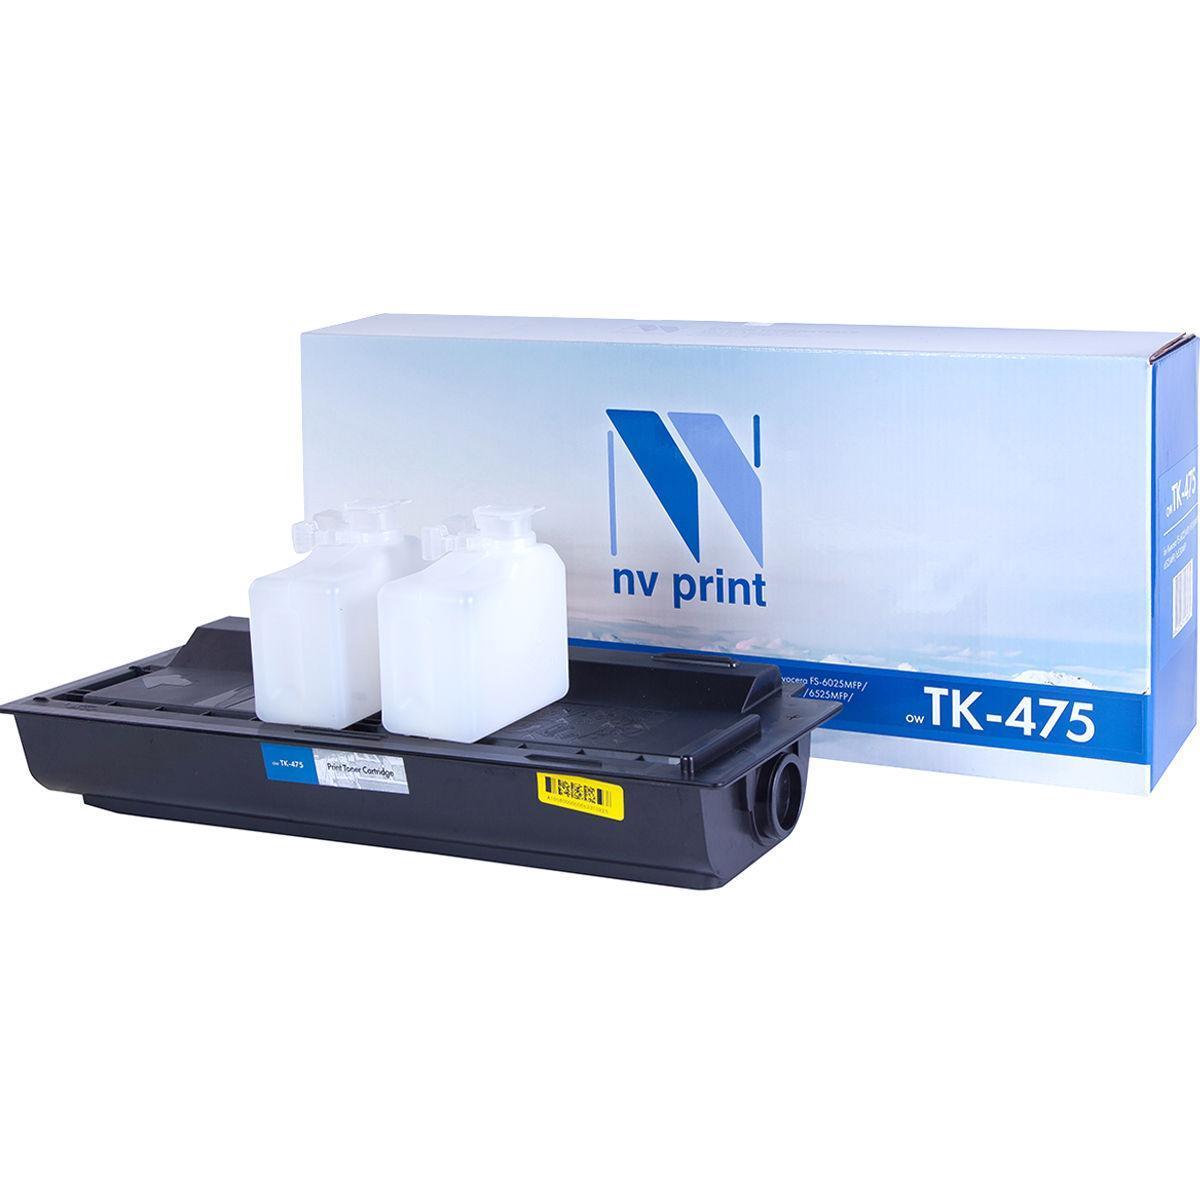 Картридж NVP совместимый Kyocera TK-475 для FS-6025MFP/6025MFP/B/6030MFP/6525MFP/6530MFP (15000k)